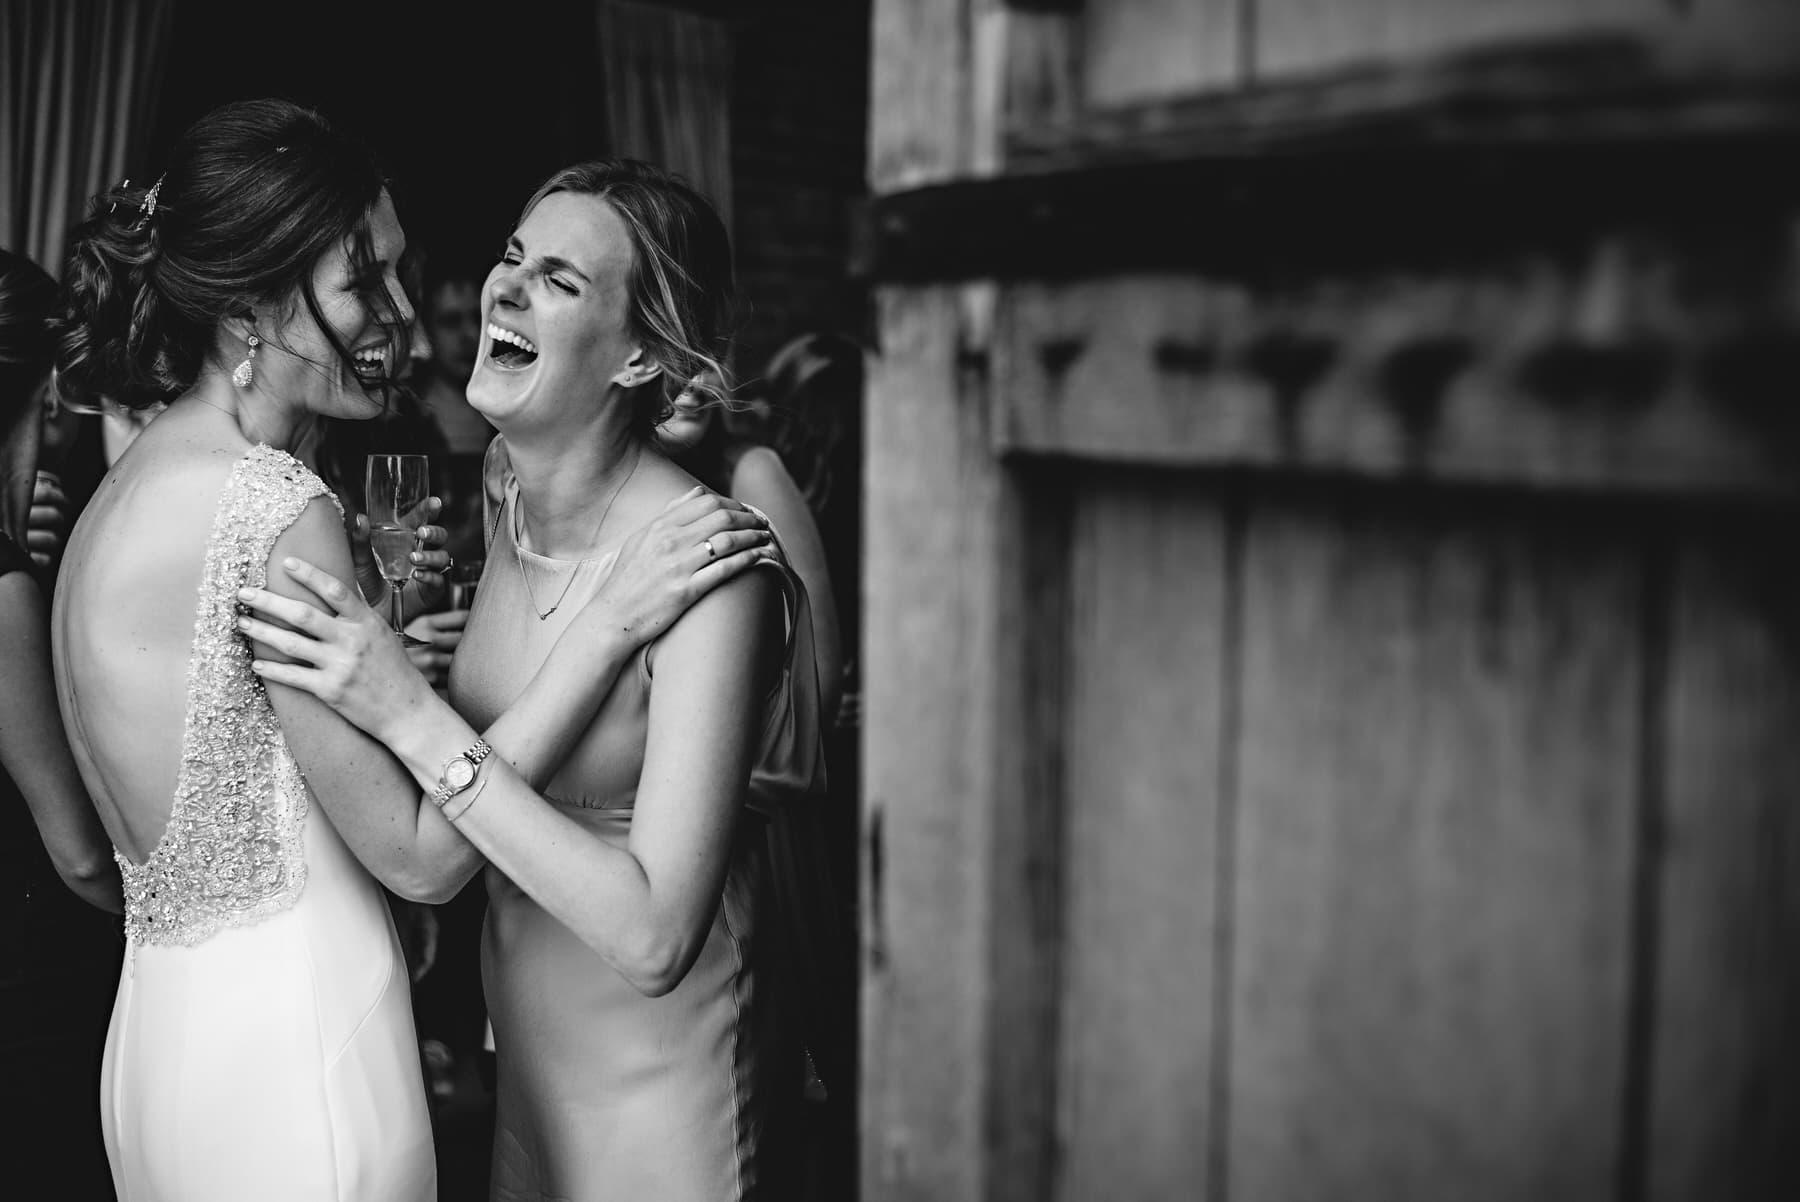 friend hugging at a wedding